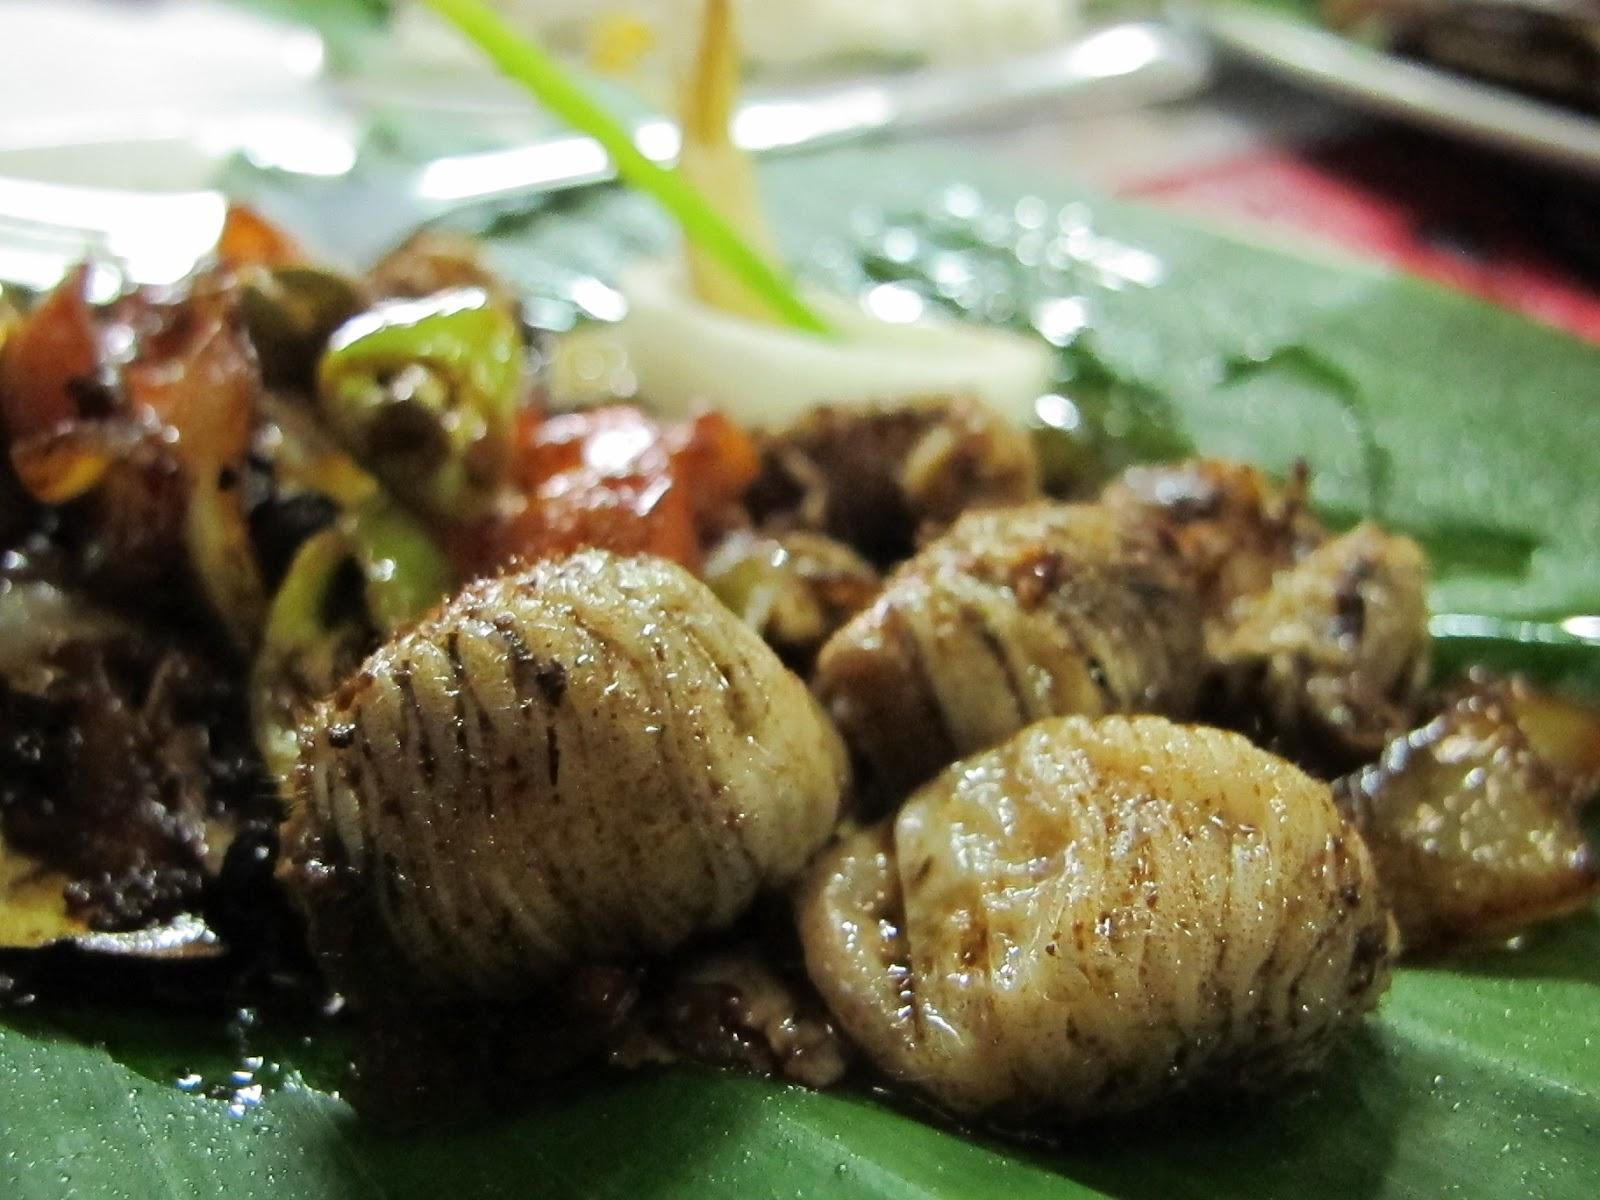 Exotic Foods in Pinas: Uok